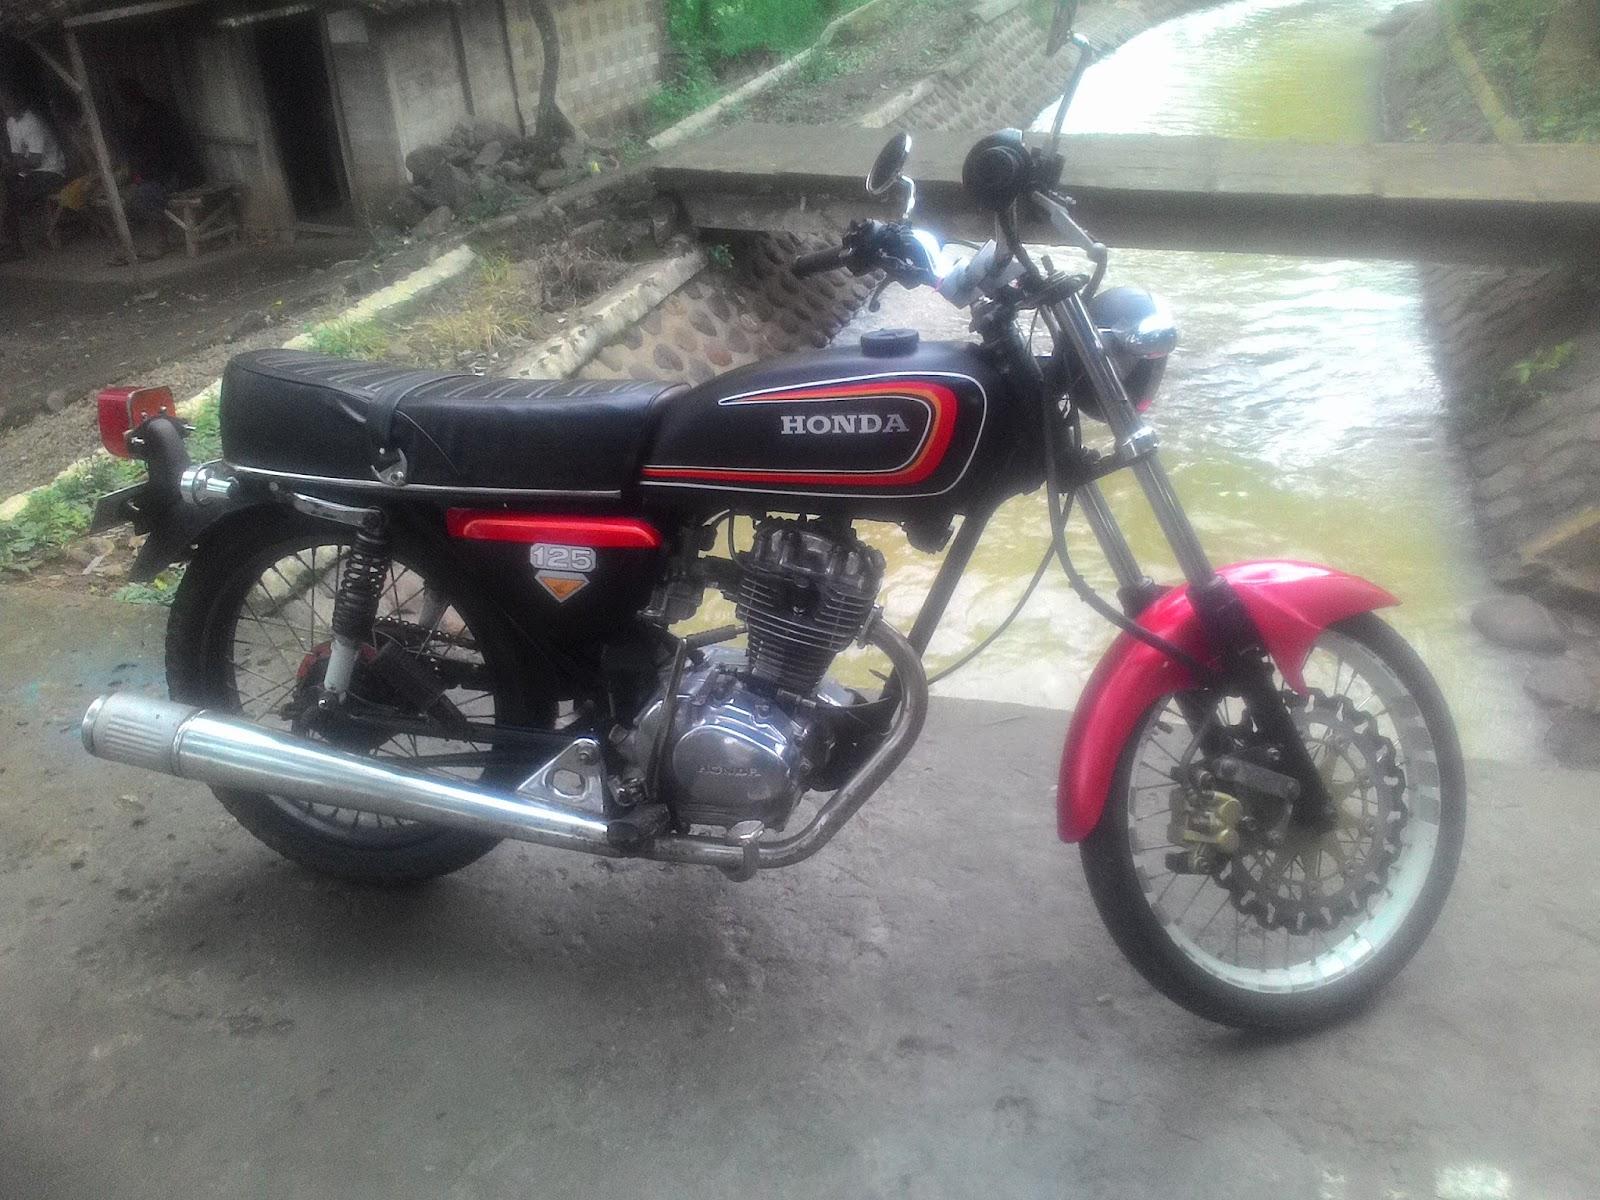 103 Modifikasi Warna Motor Cb 100 Modifikasi Motor Honda CB Terbaru